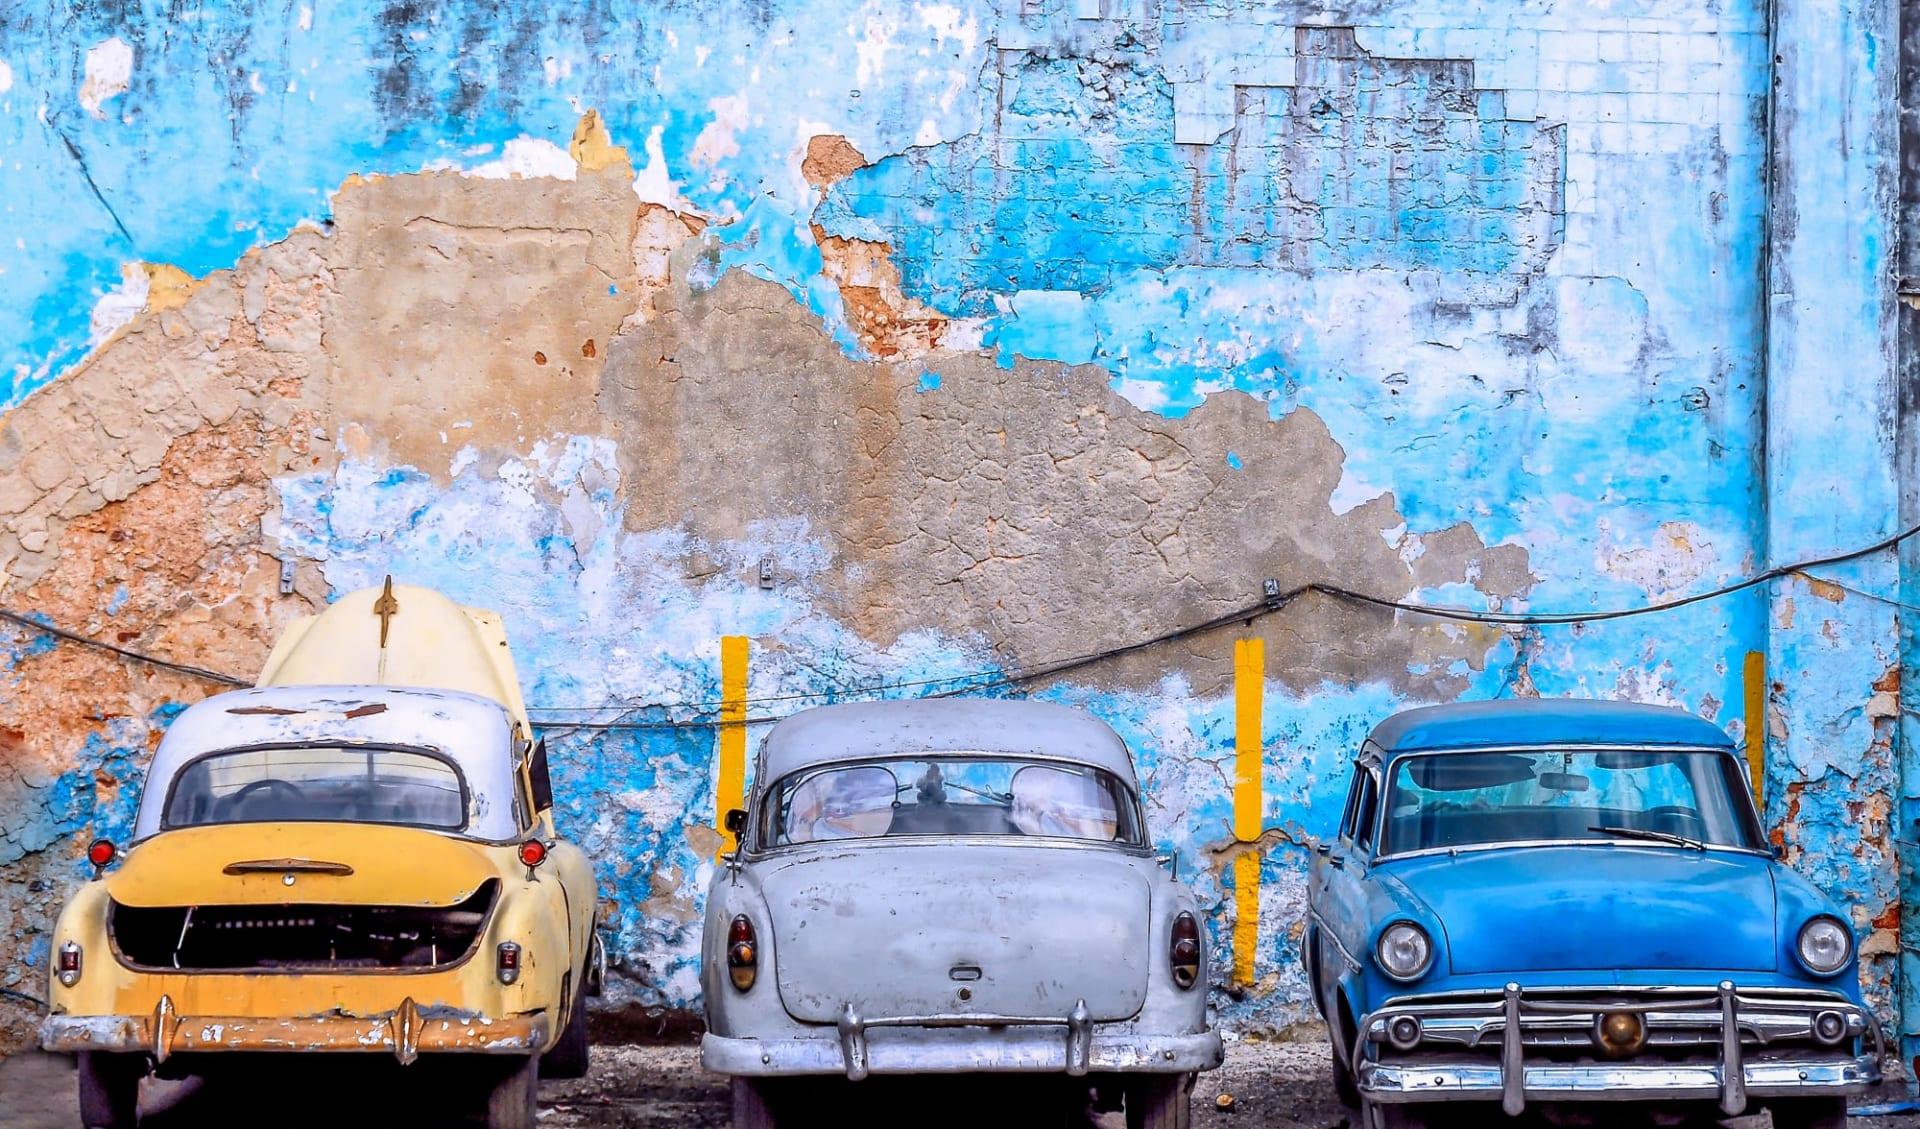 Kuba für kleine Entdecker ab Havanna: Karibik_Havanna_Cars